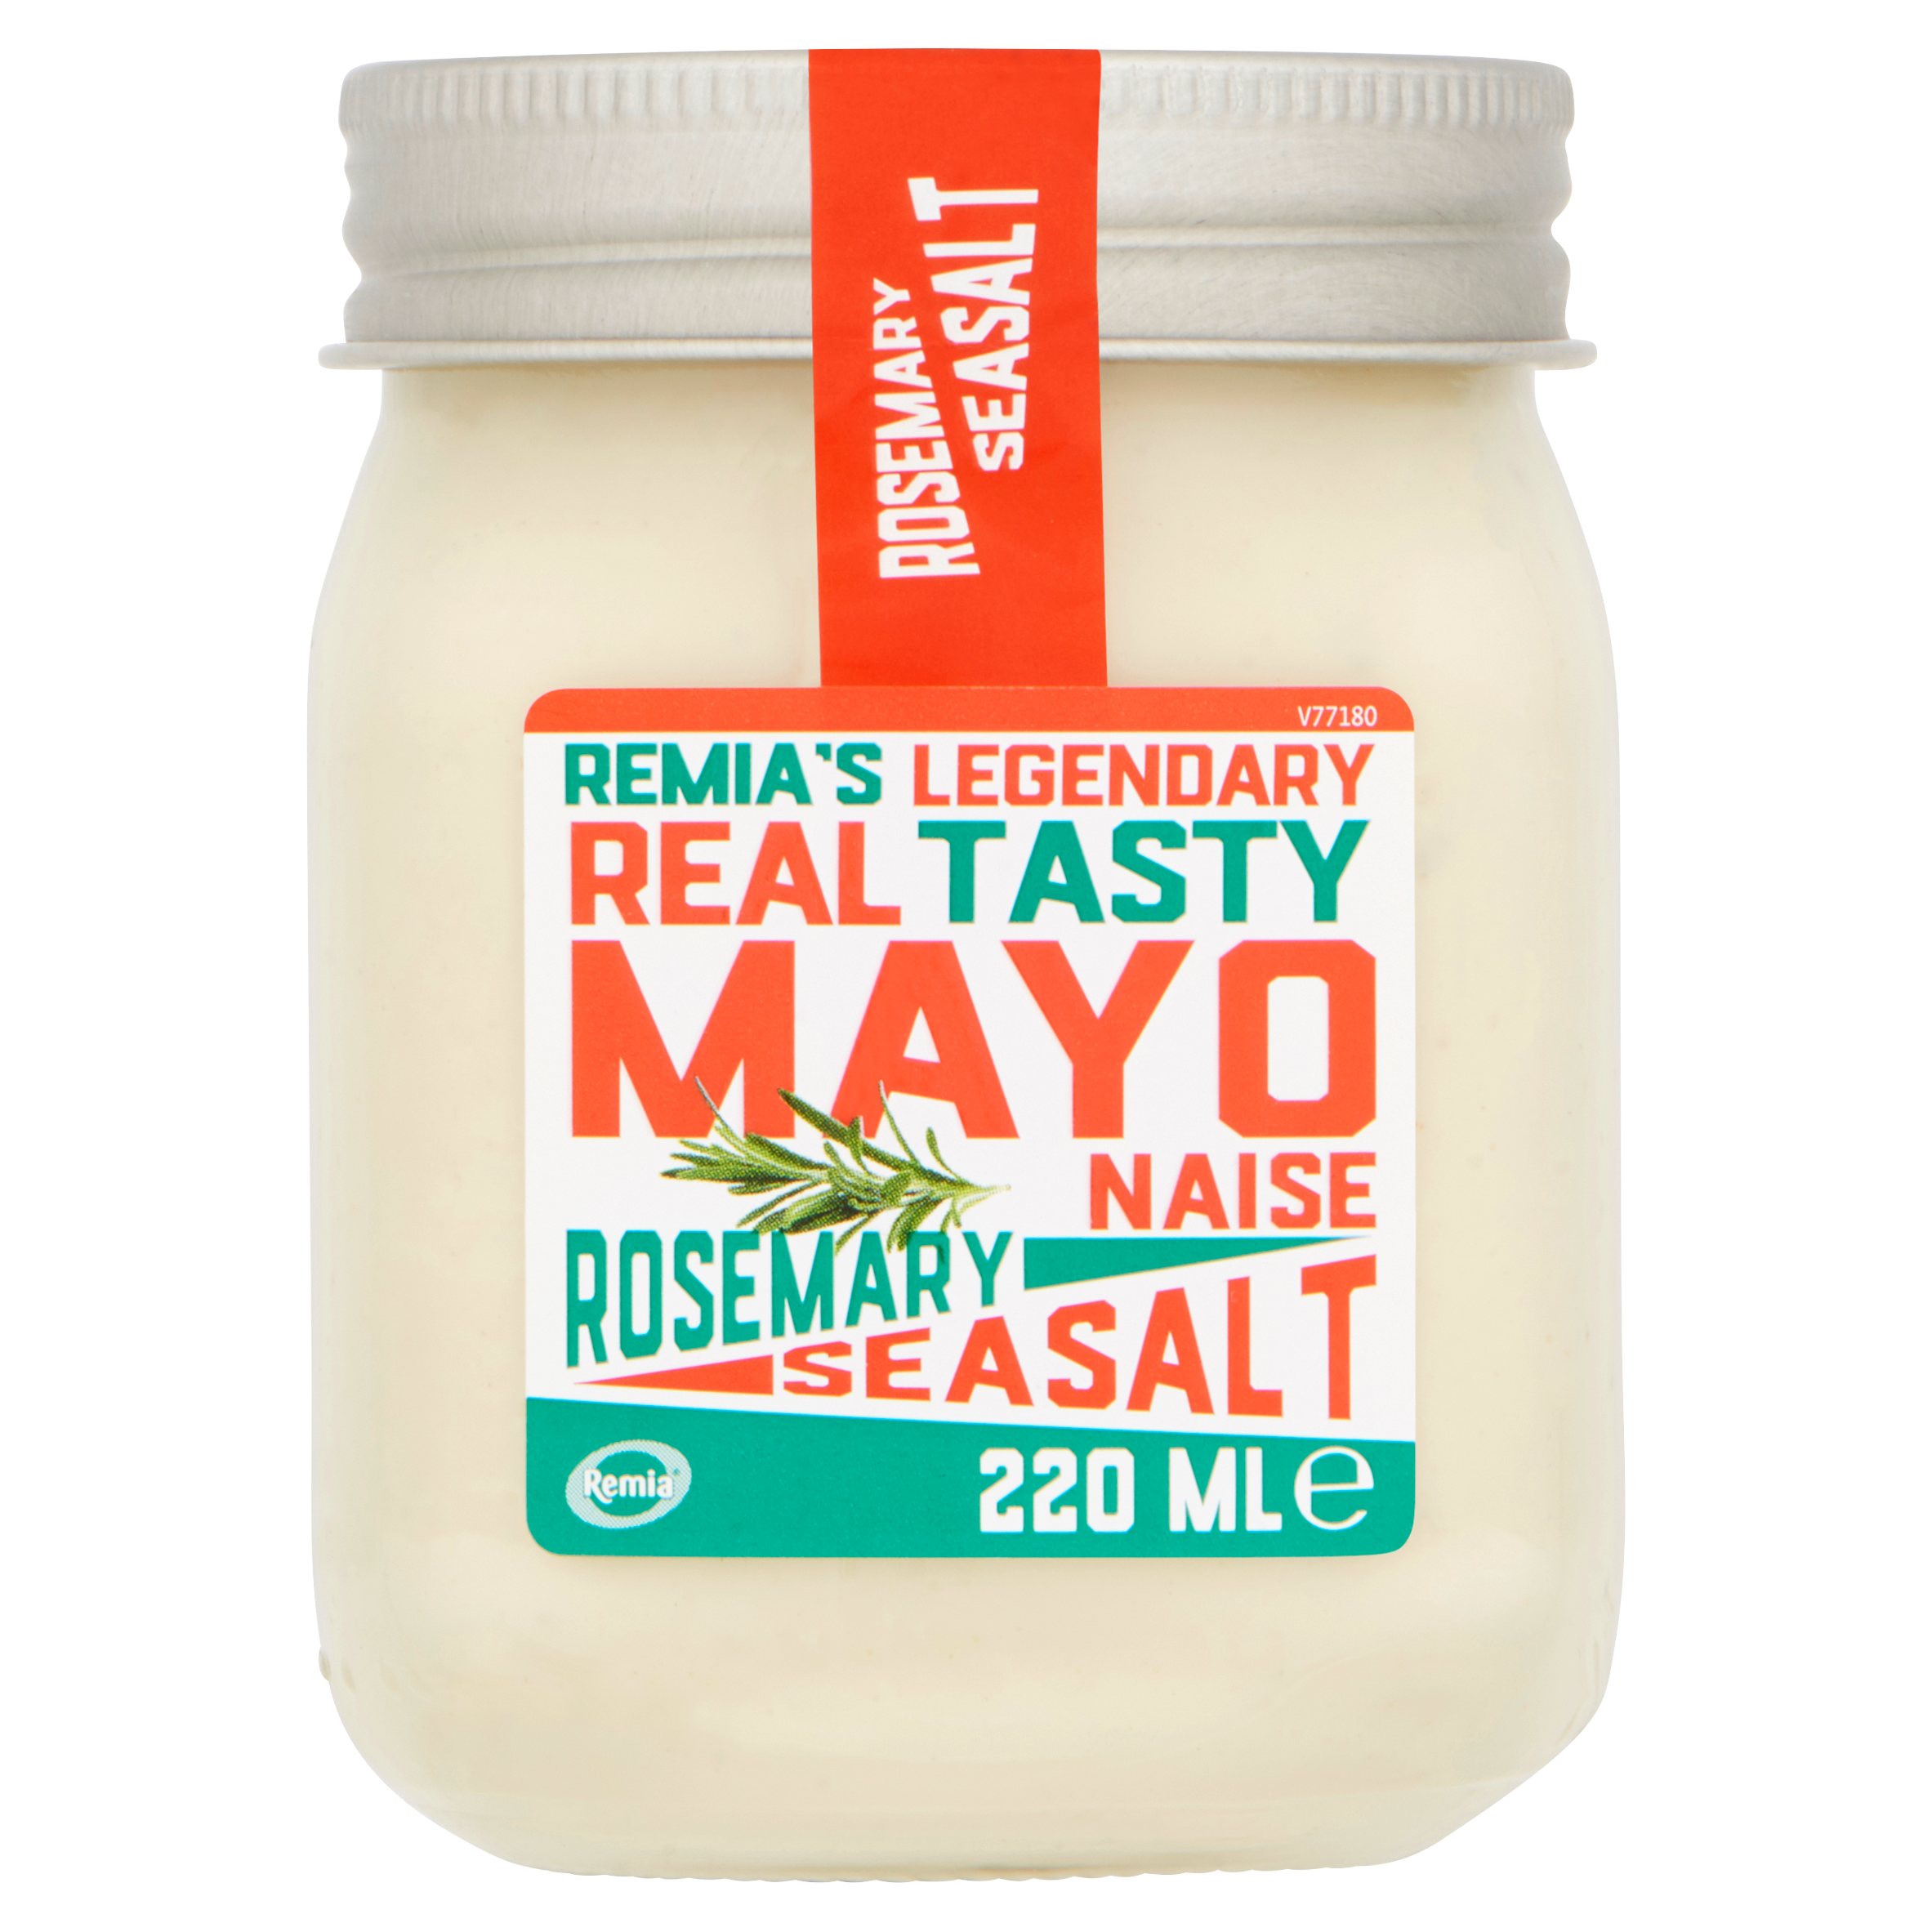 Remia's Legendary Real Tasty Mayonaise Rosemary Seasalt 220 ml